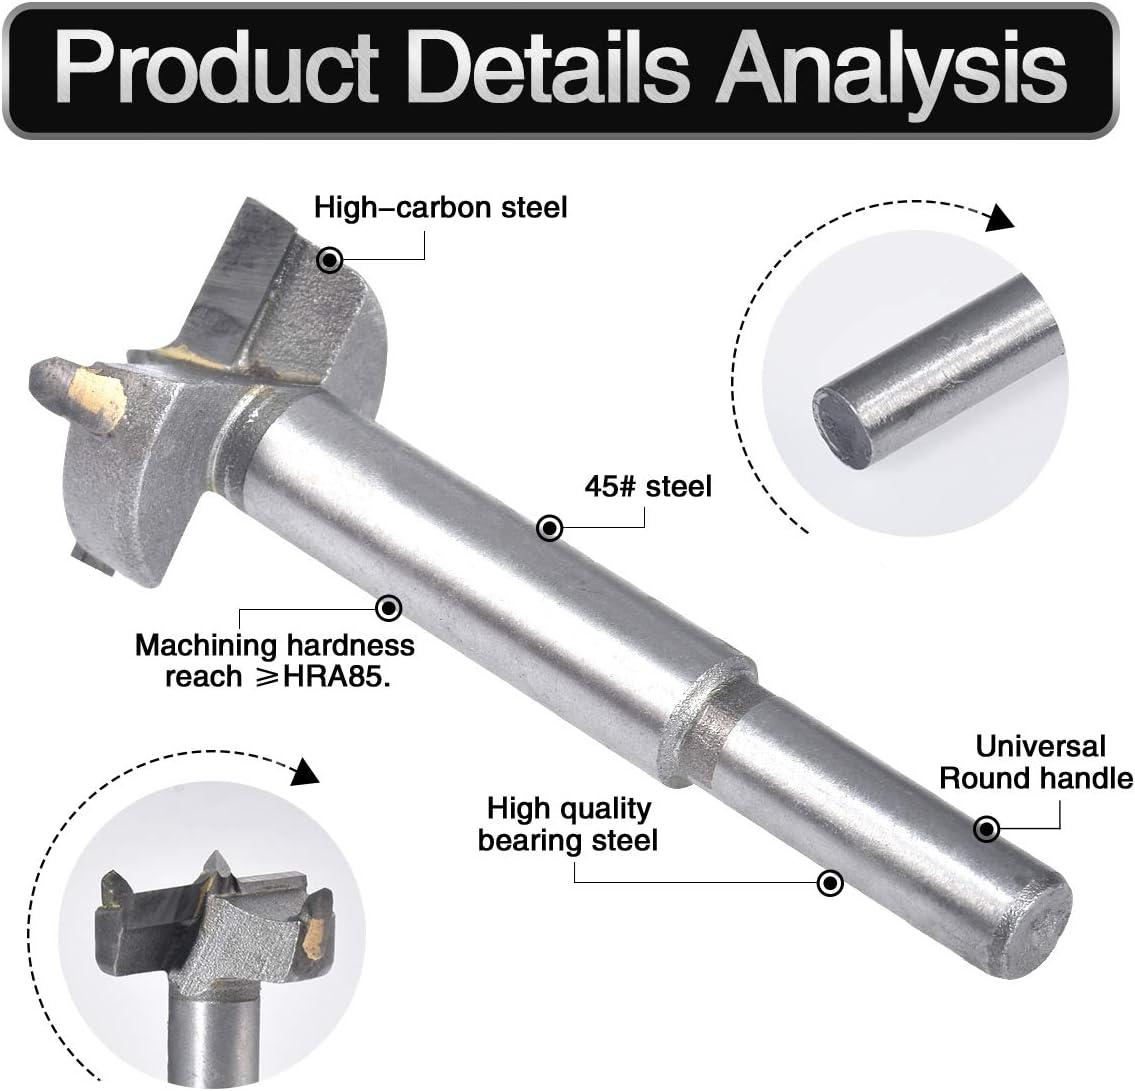 SET HIGH QUALITY WOOD//HINGE DRILLS SIZES 10-60mm FORSTNER BITS